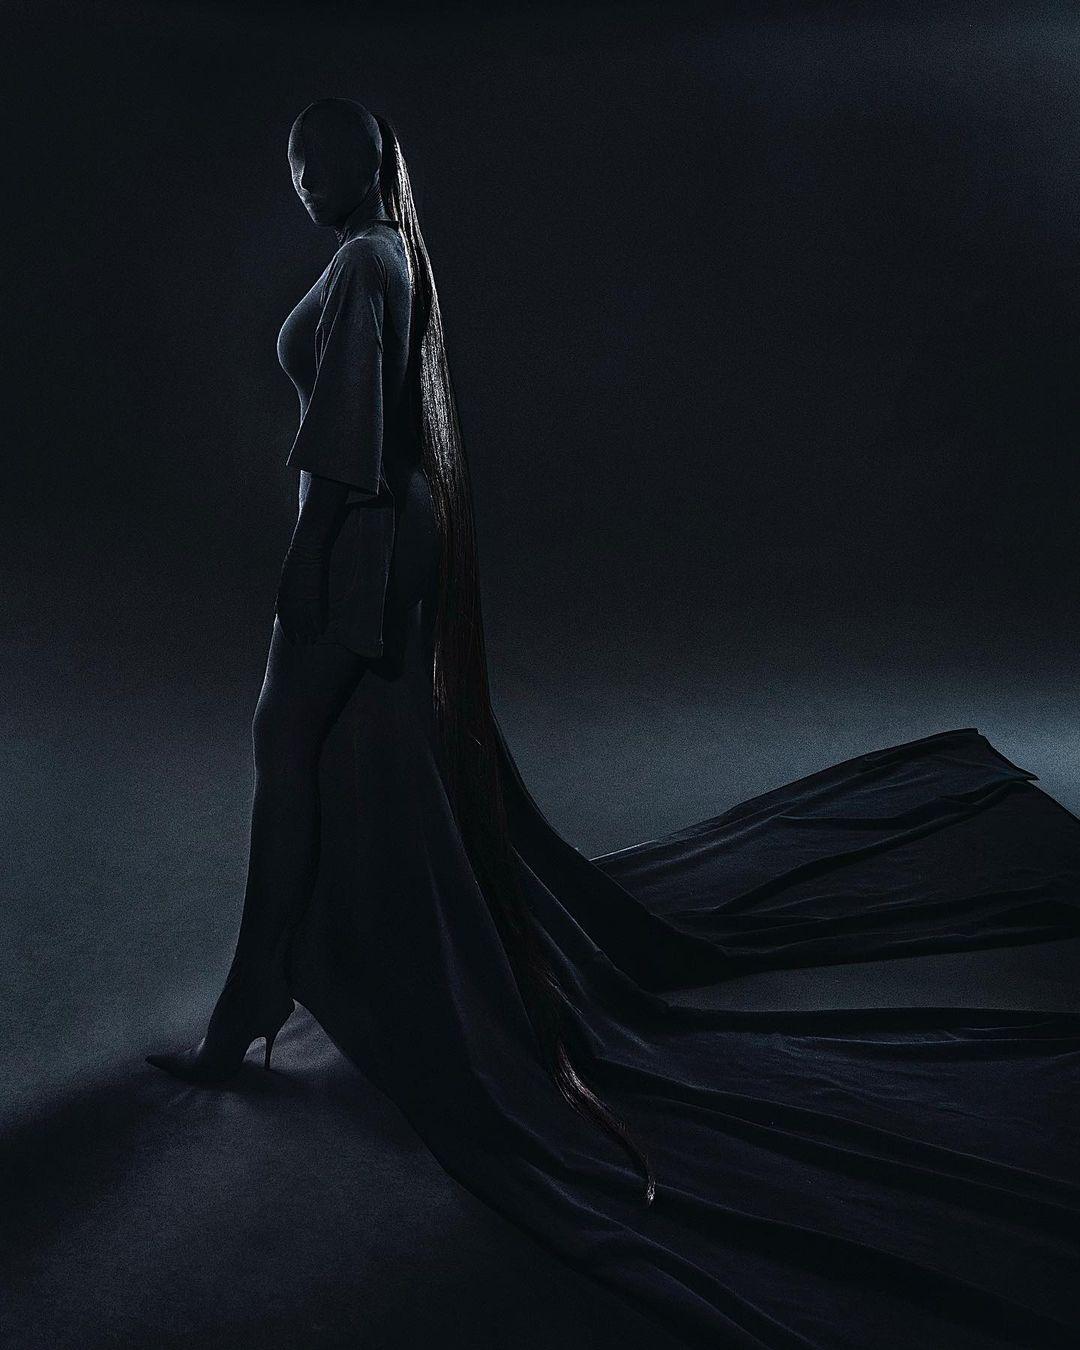 Met Gala 2021: Образ Ким Кардашьян – total-look и модная маска-Фото 1